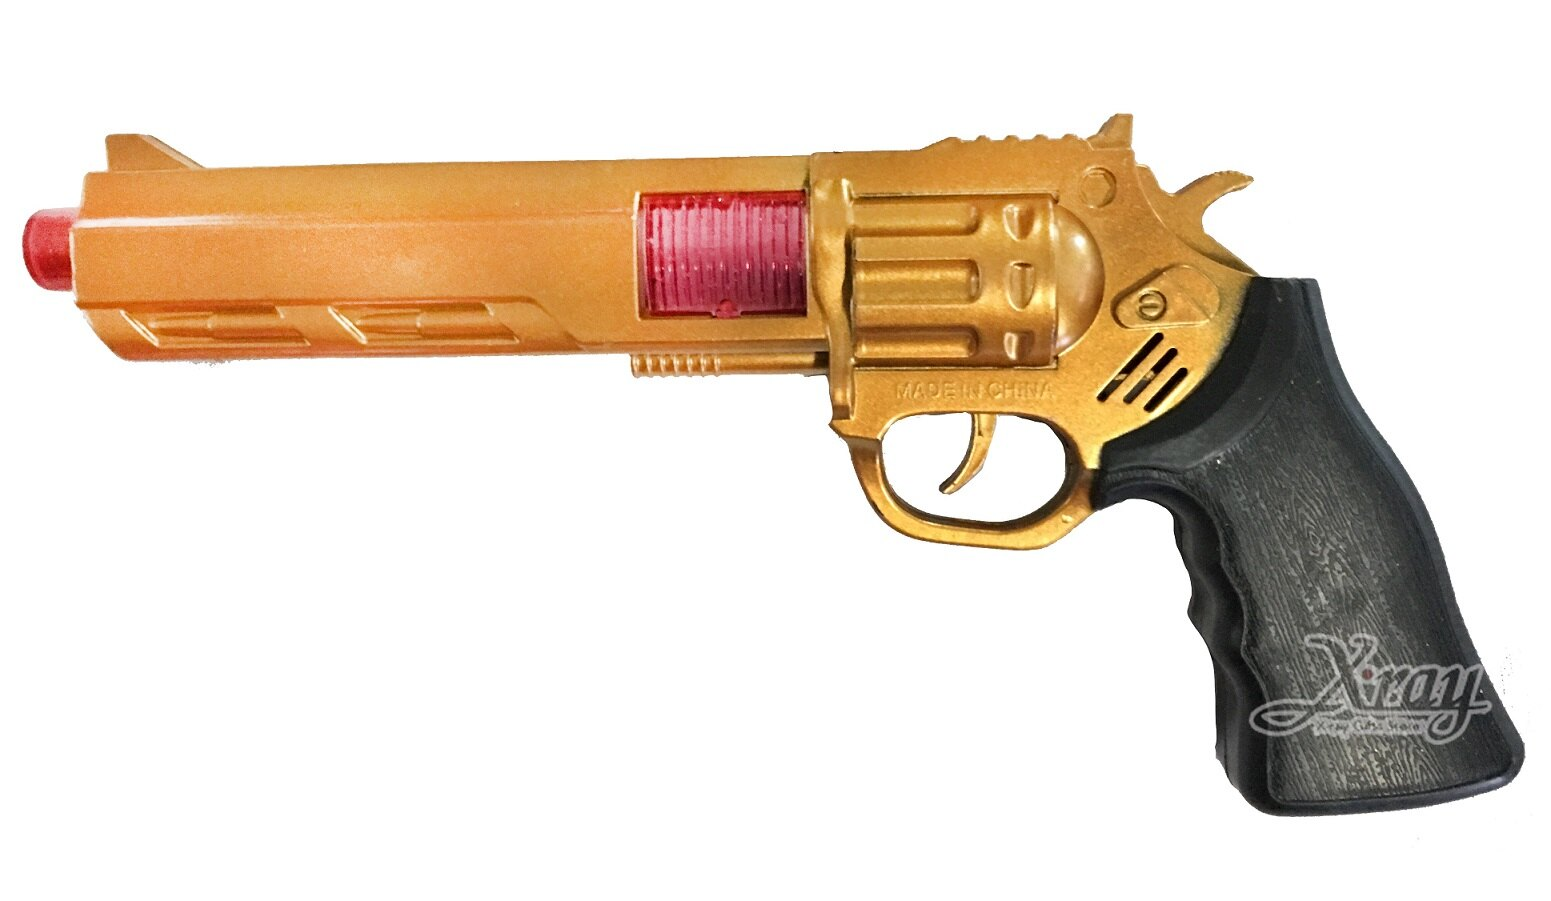 X射線【W287387】10吋西部警長手槍,萬聖節 / 武器 / 道具槍 / Party / 遊戲槍 / 玩具槍 / 武器配件 0